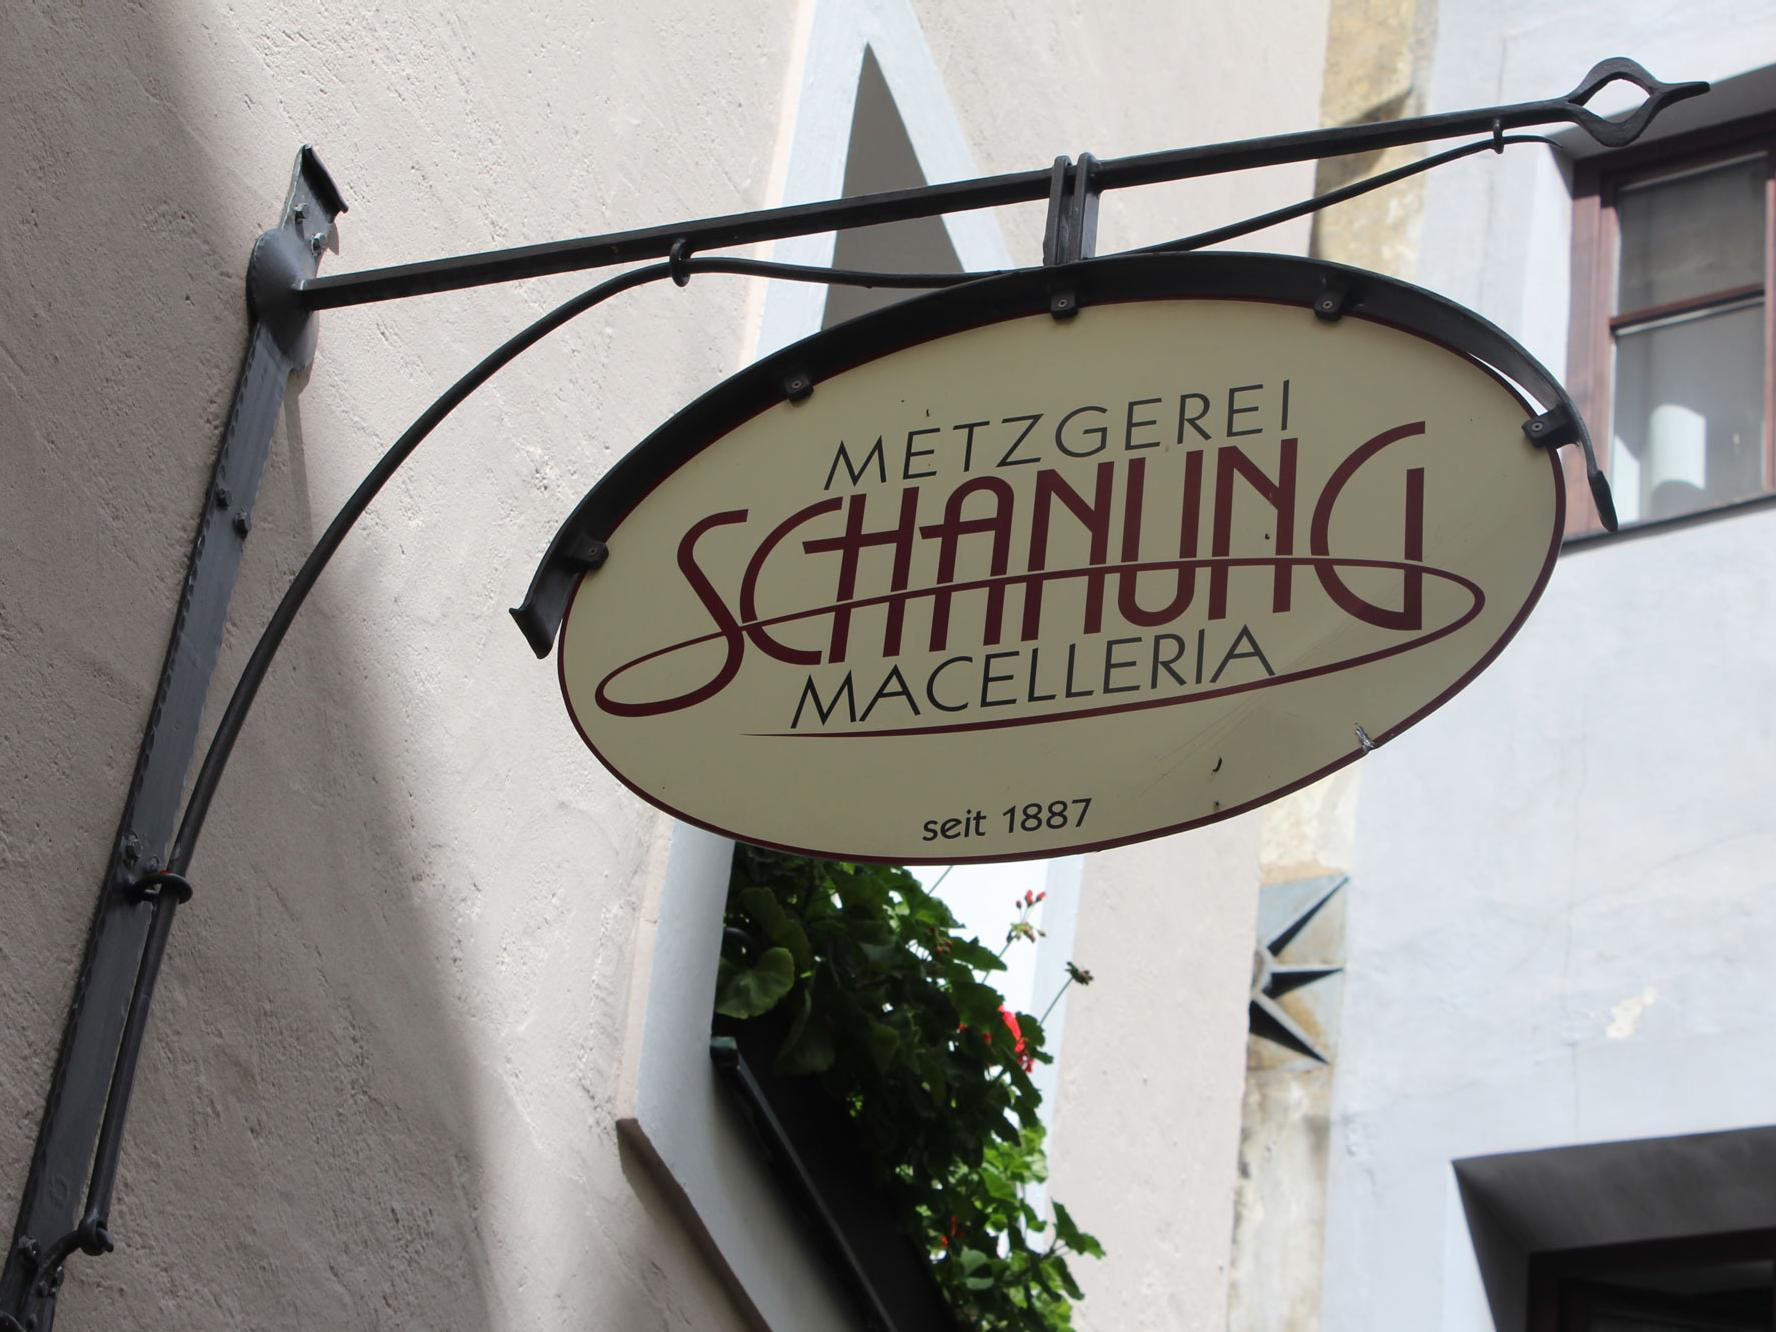 Butcher's shop Schanung